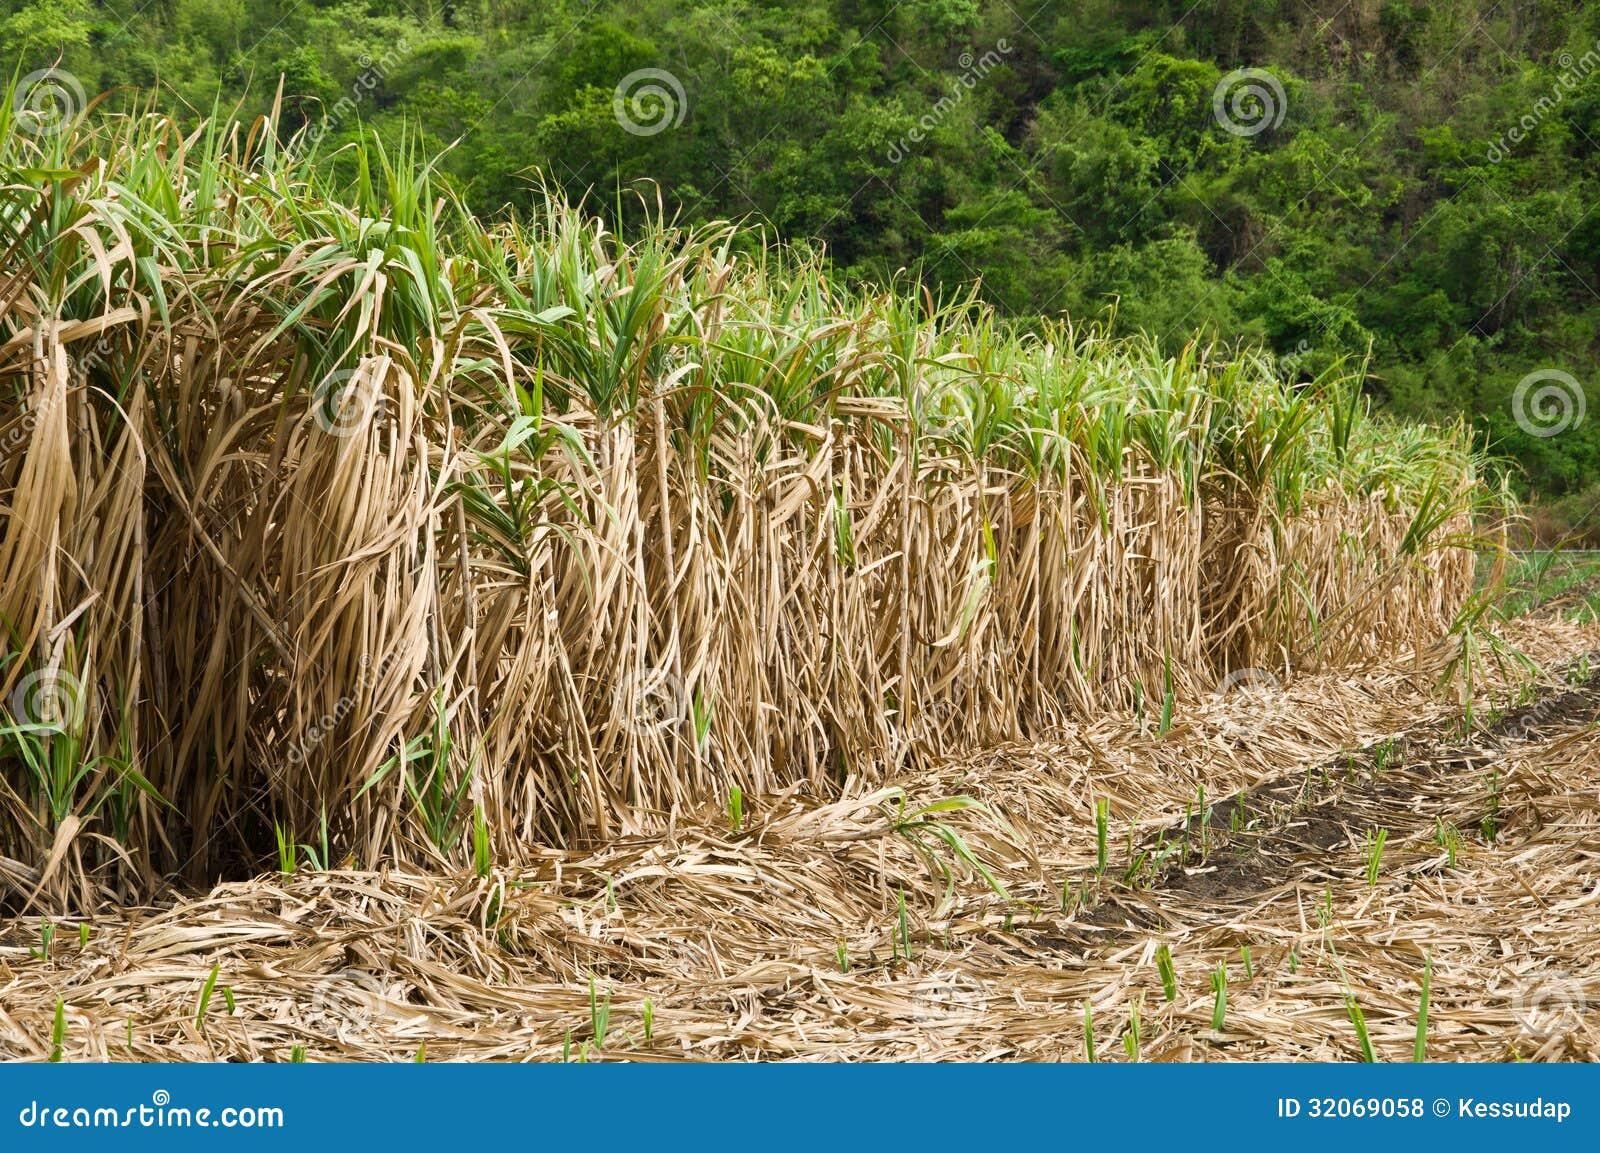 Sugarcane Juice Business Plan, Ideas & Opportunities